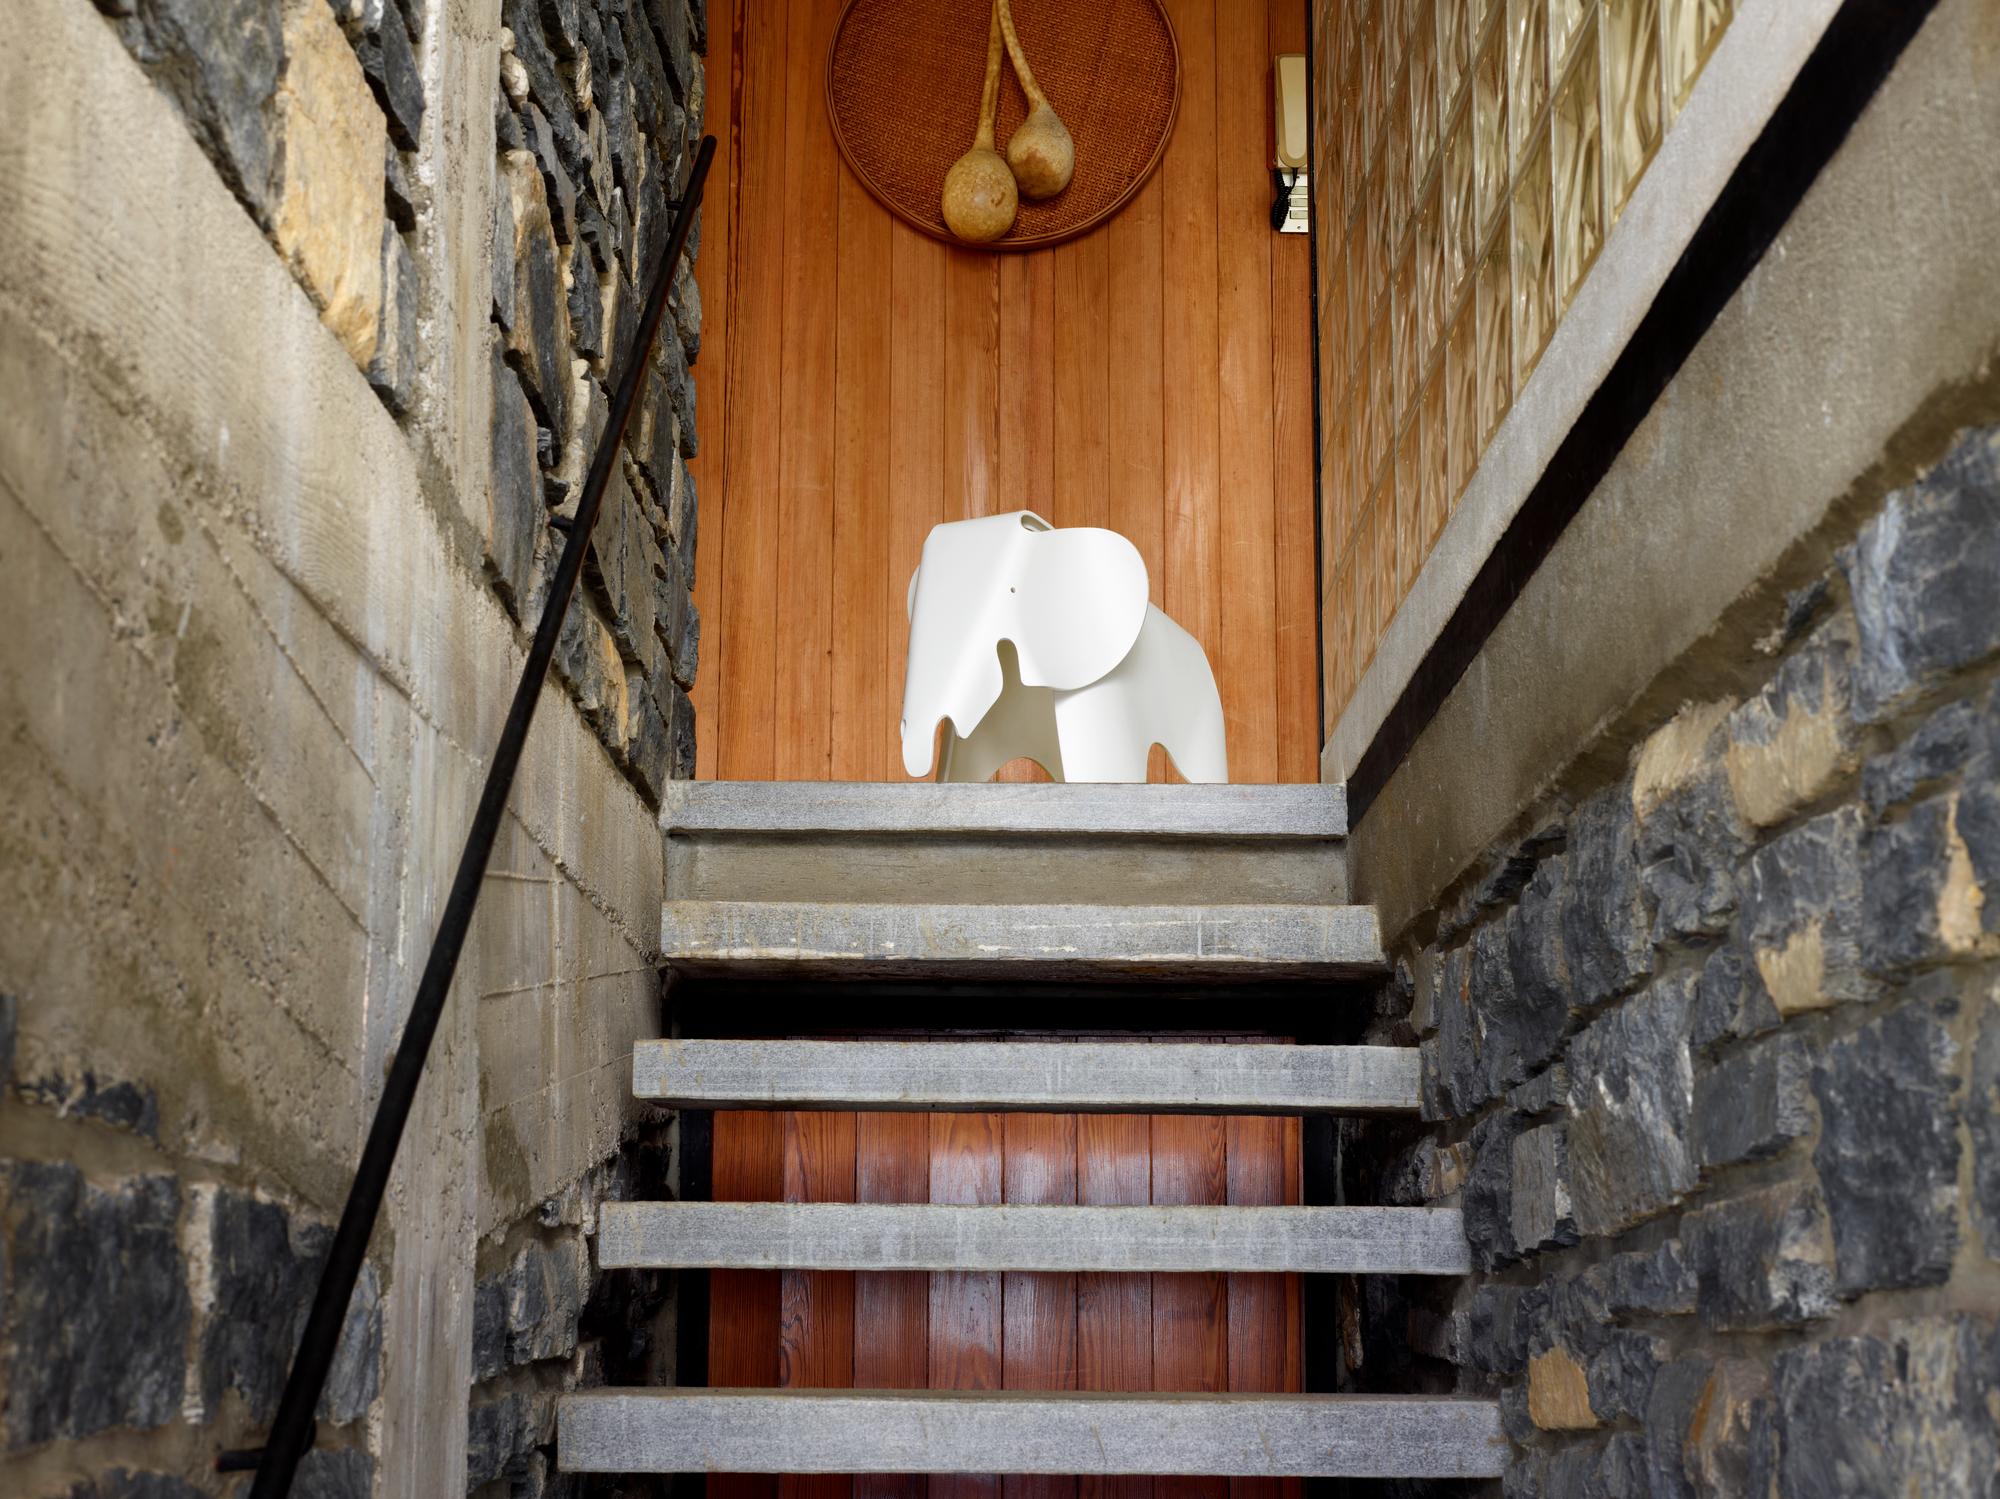 Eames Elephant Stool Vitra